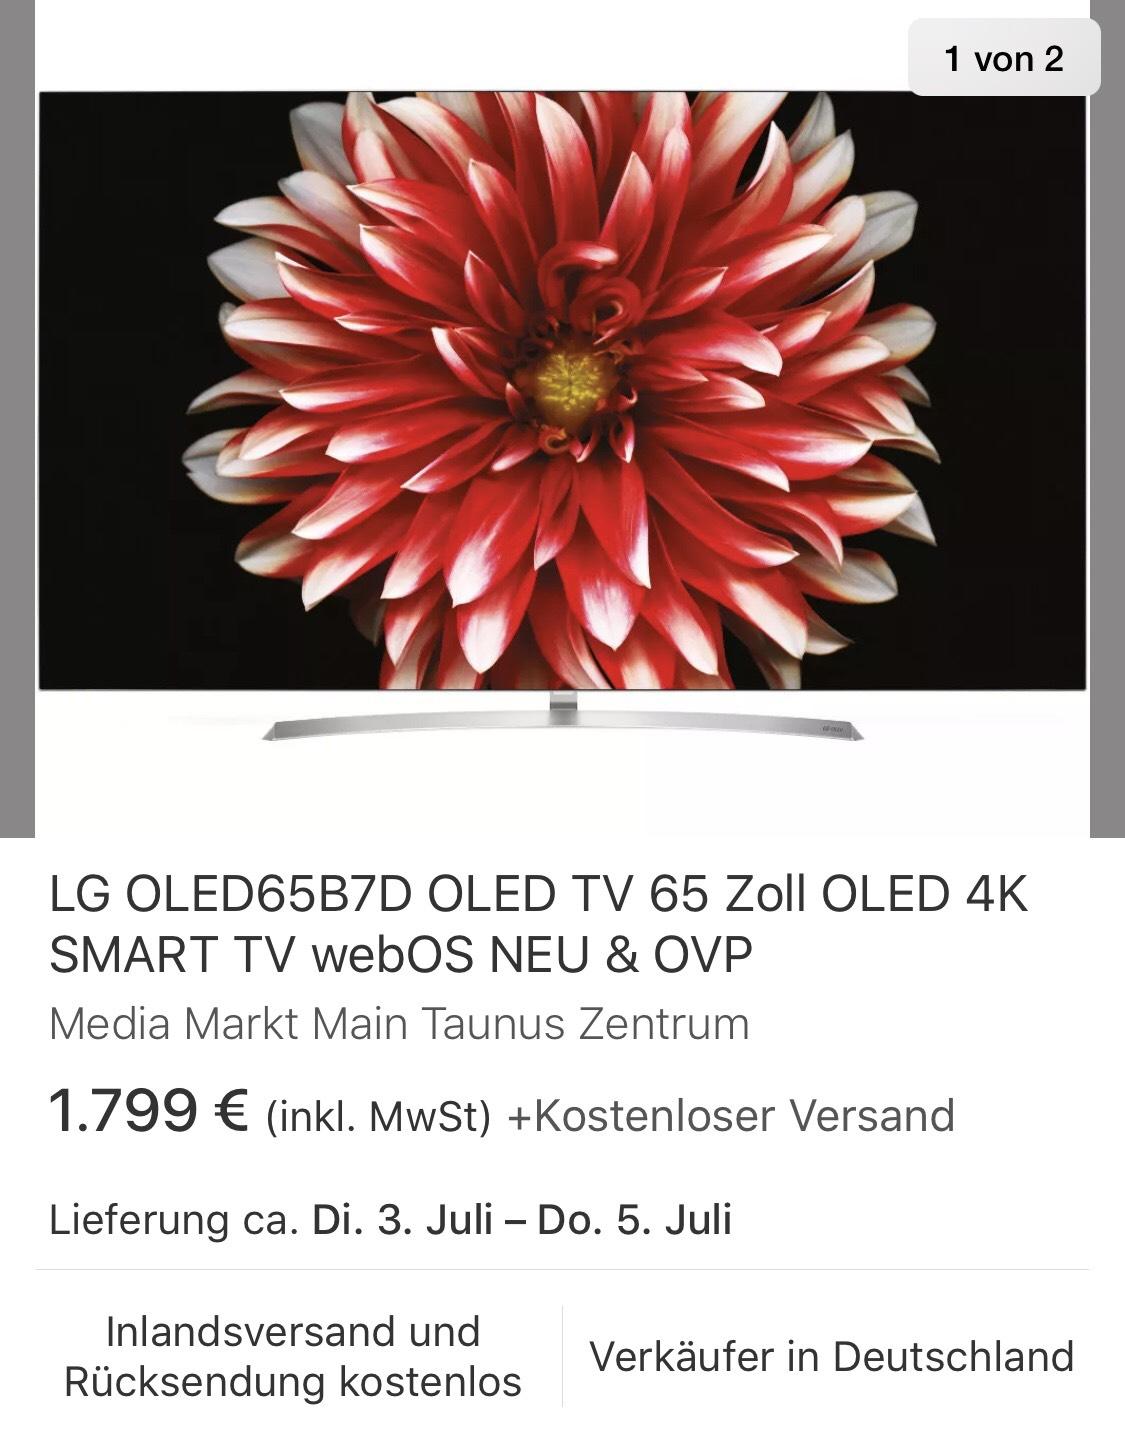 LG OLED65B7D OLED TV 65 Zoll 4K SMART TV für 1.799,-€ LG OLED55B7D für 1.199,-€ [eBay, Media Markt Main Taunus Zentrum]